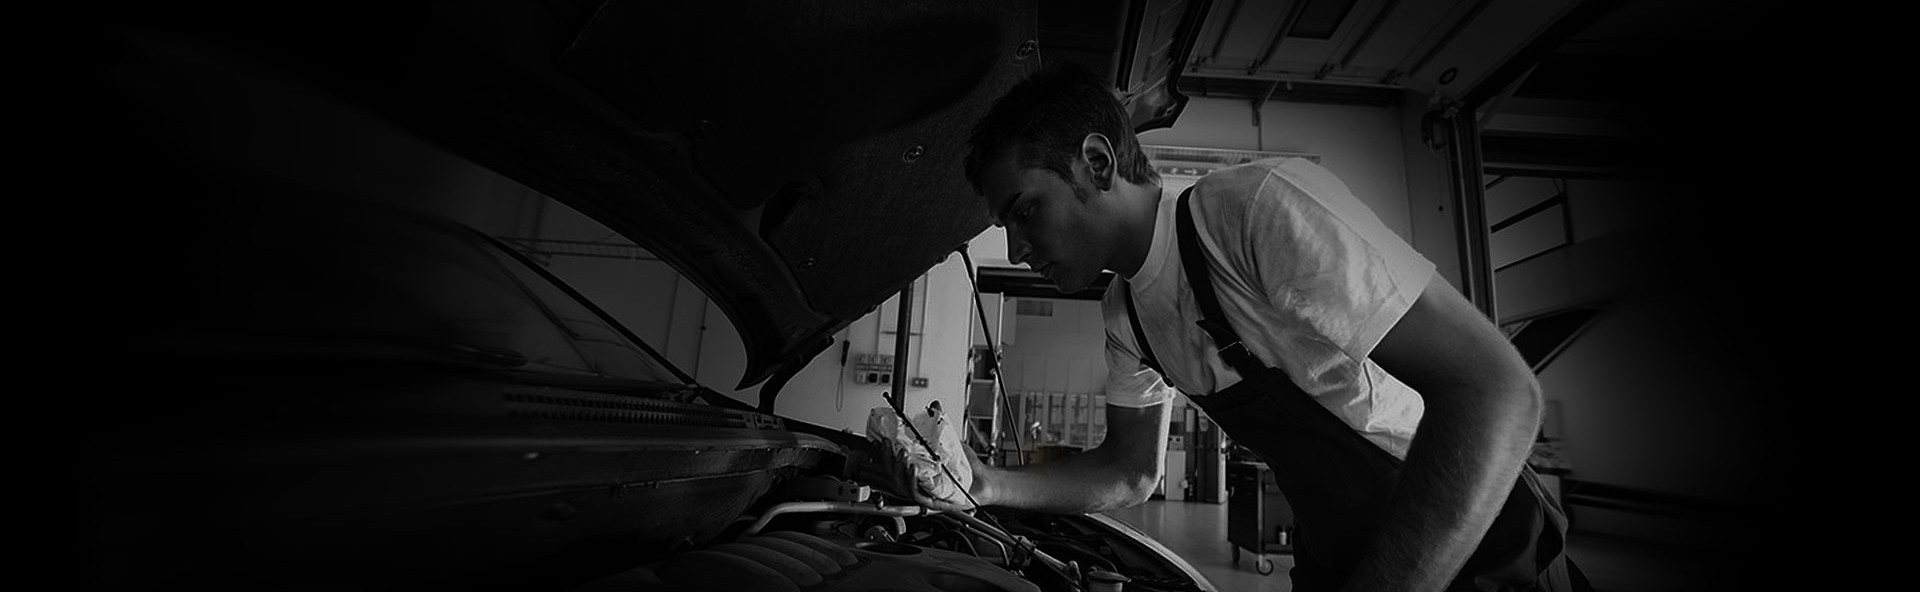 trust, auto repair, Houston, auto care, a+